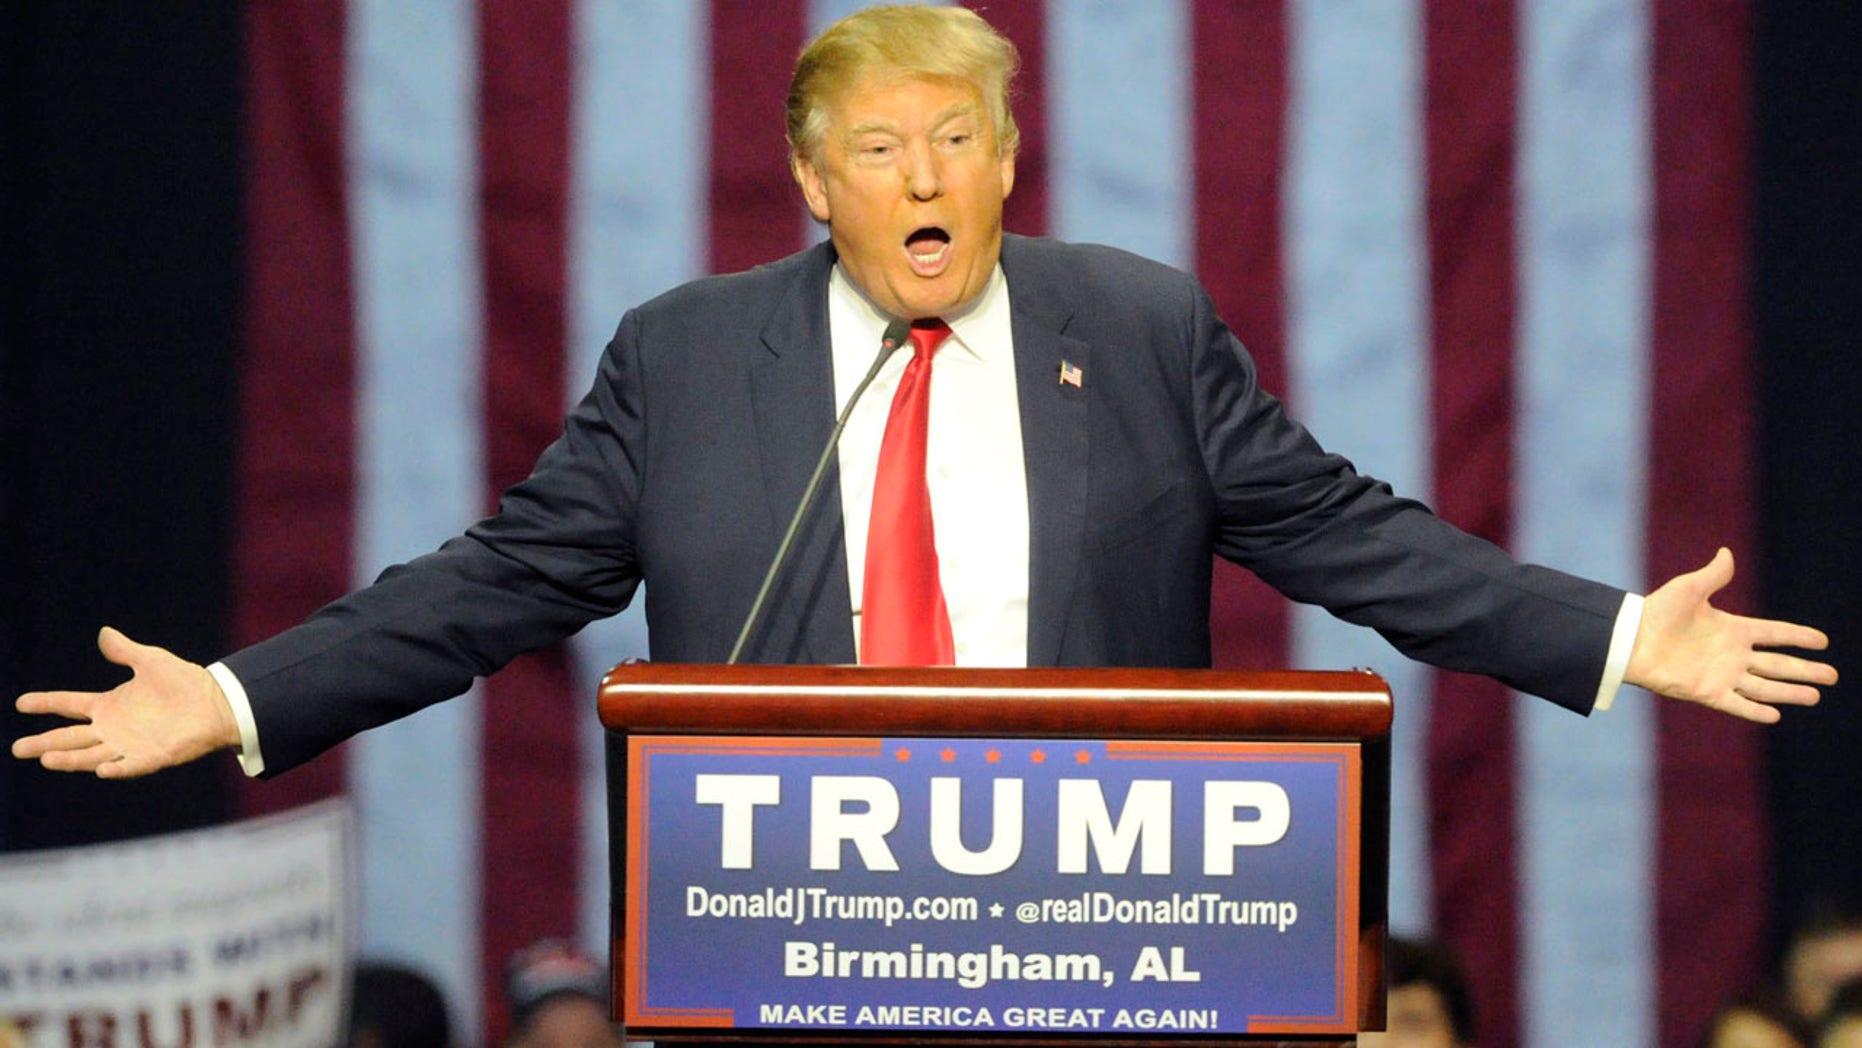 Nov. 21, 2015: Republican presidential candidate Donald Trump speaks during a campaign stop in Birmingham, Ala. (AP Photo/Eric Schultz)